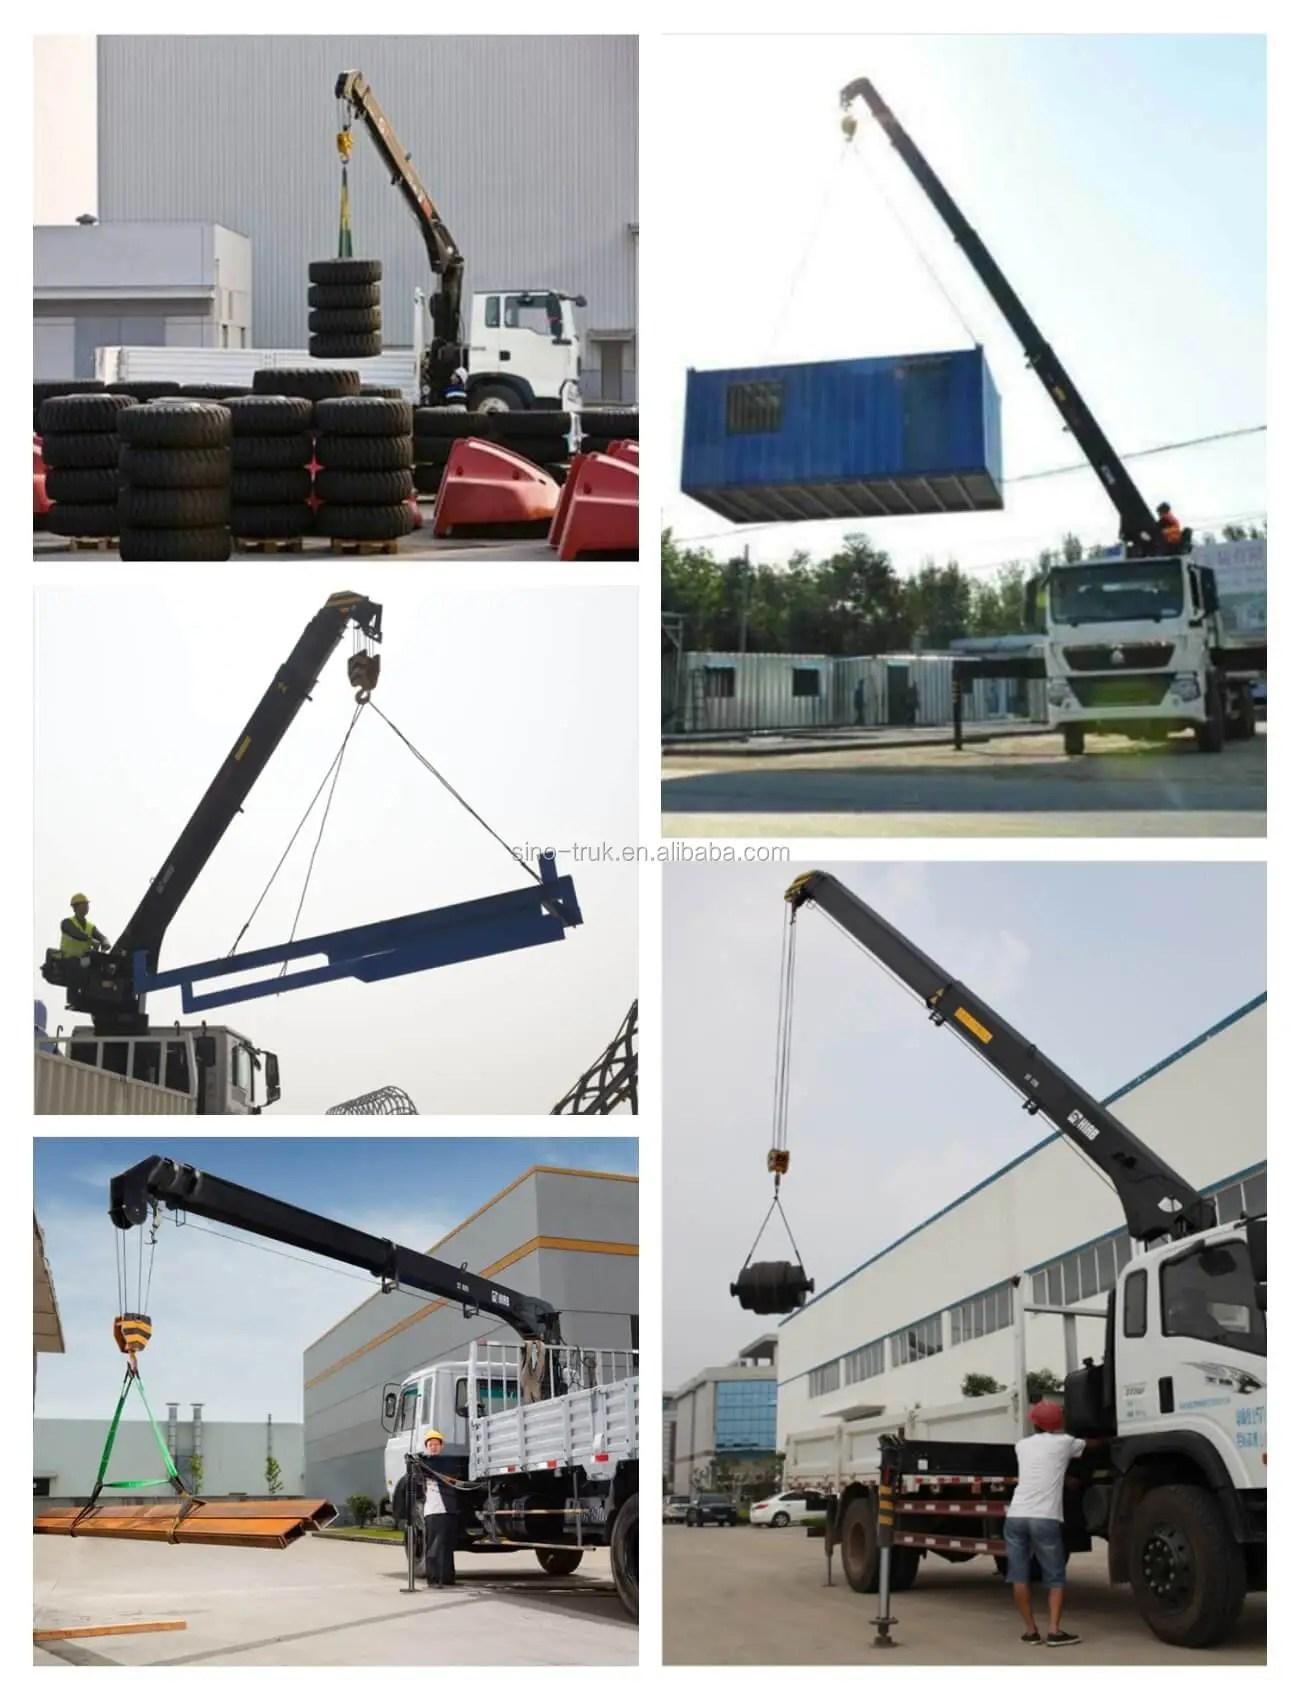 5 Ton Crane Truck For Sale : crane, truck, Lifting, Capacity, Crane, Truck, Mounted, India, Mounted,Truck, Specifications,Mini, Product, Alibaba.com